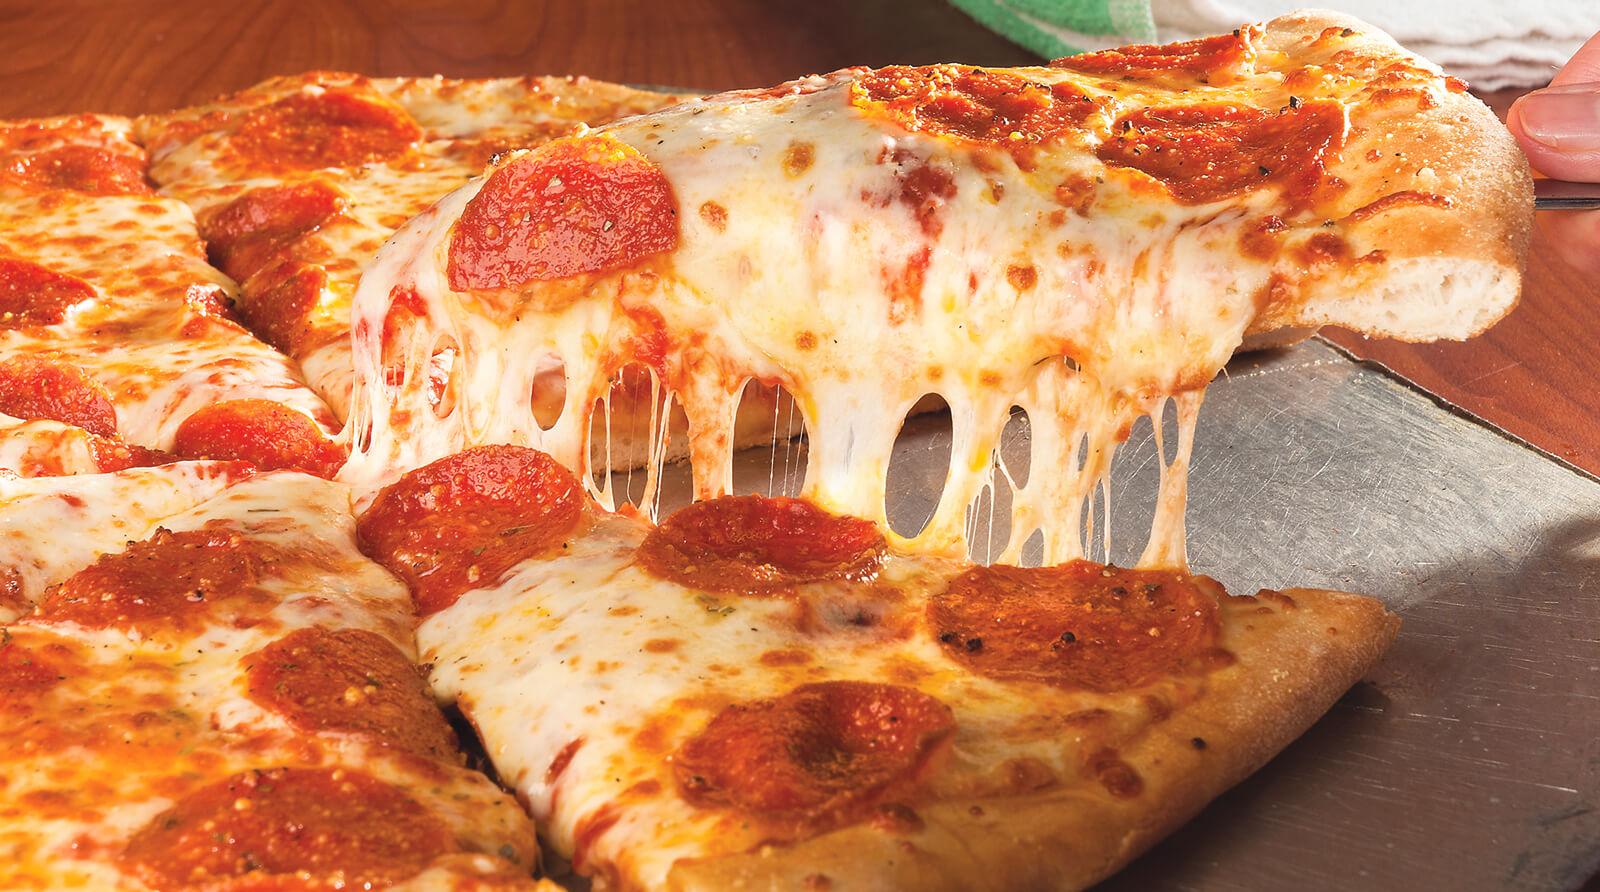 Go Home Pizza Boy